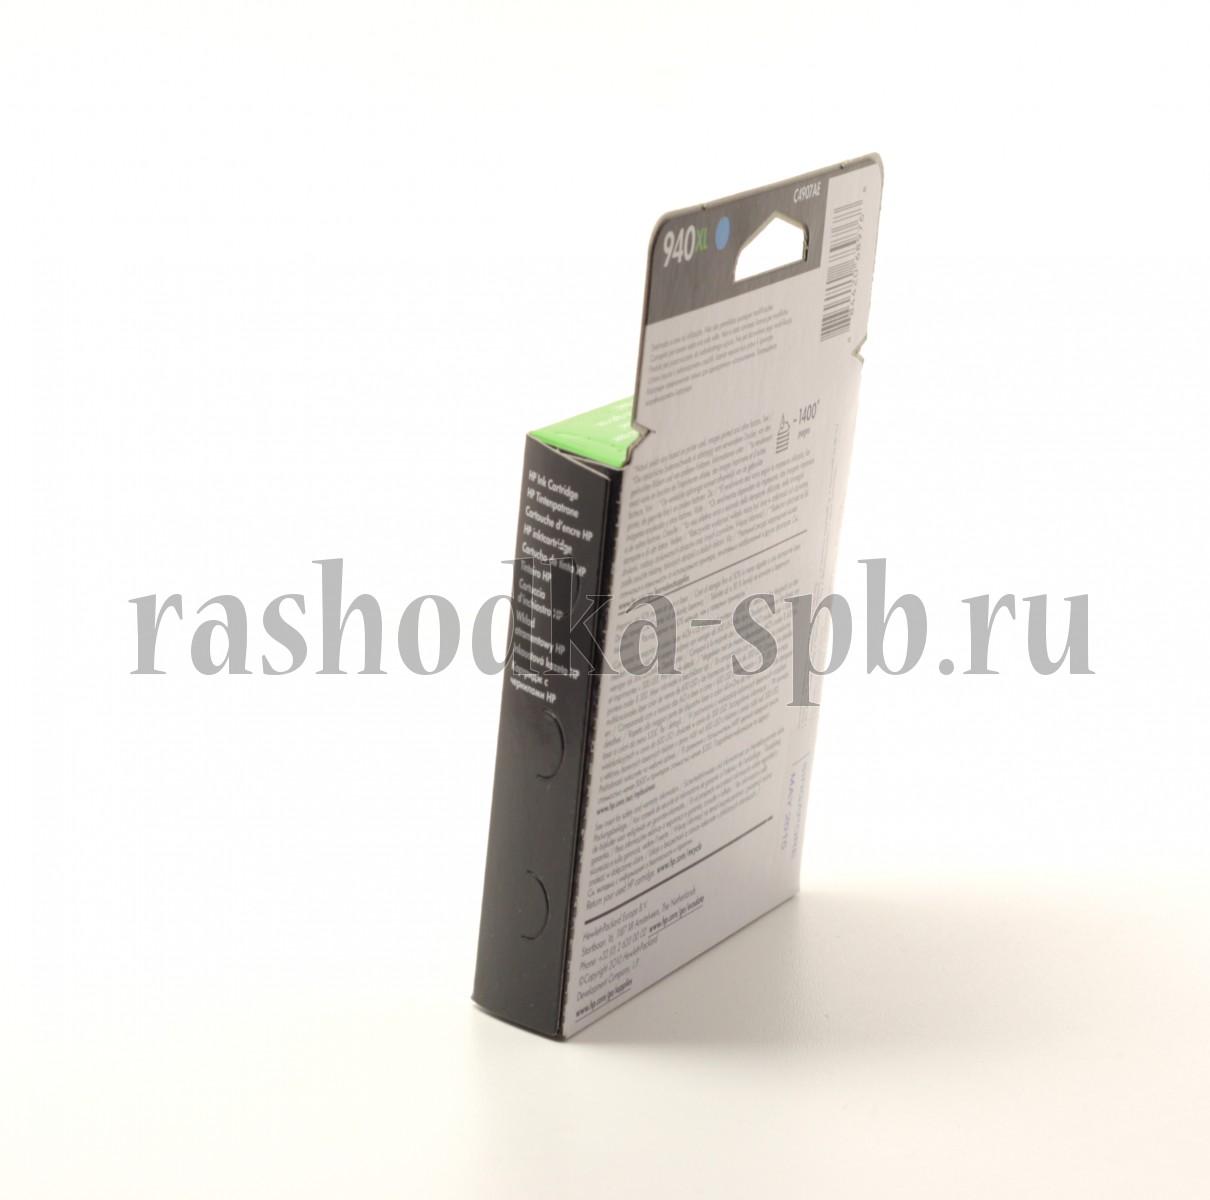 Картридж HP C4902AE №940 для Officejet Pro 8000 8500 черный